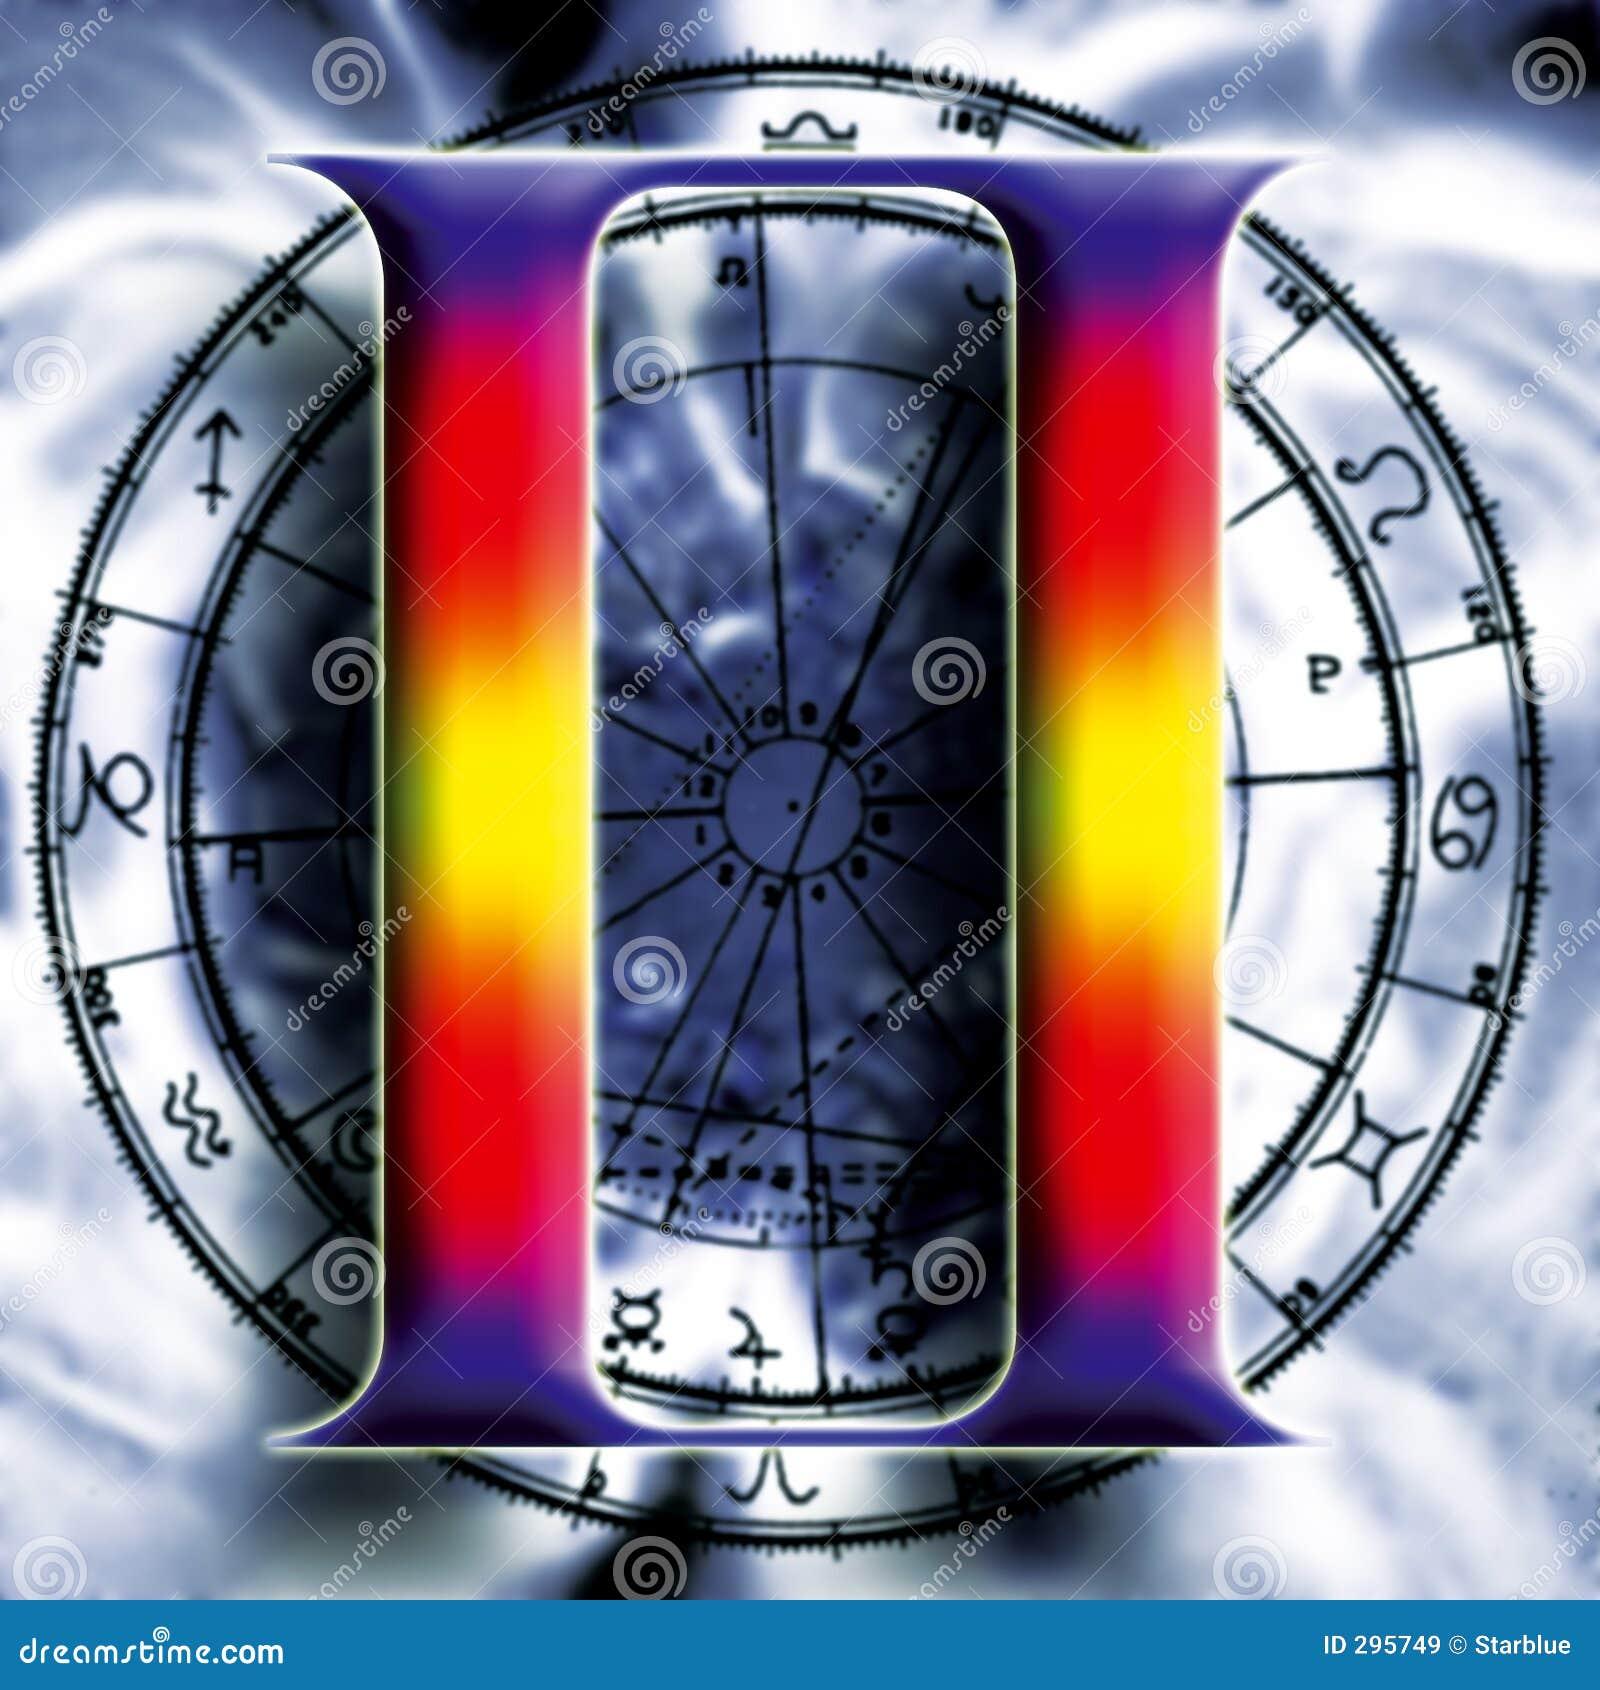 Astrology: gemini